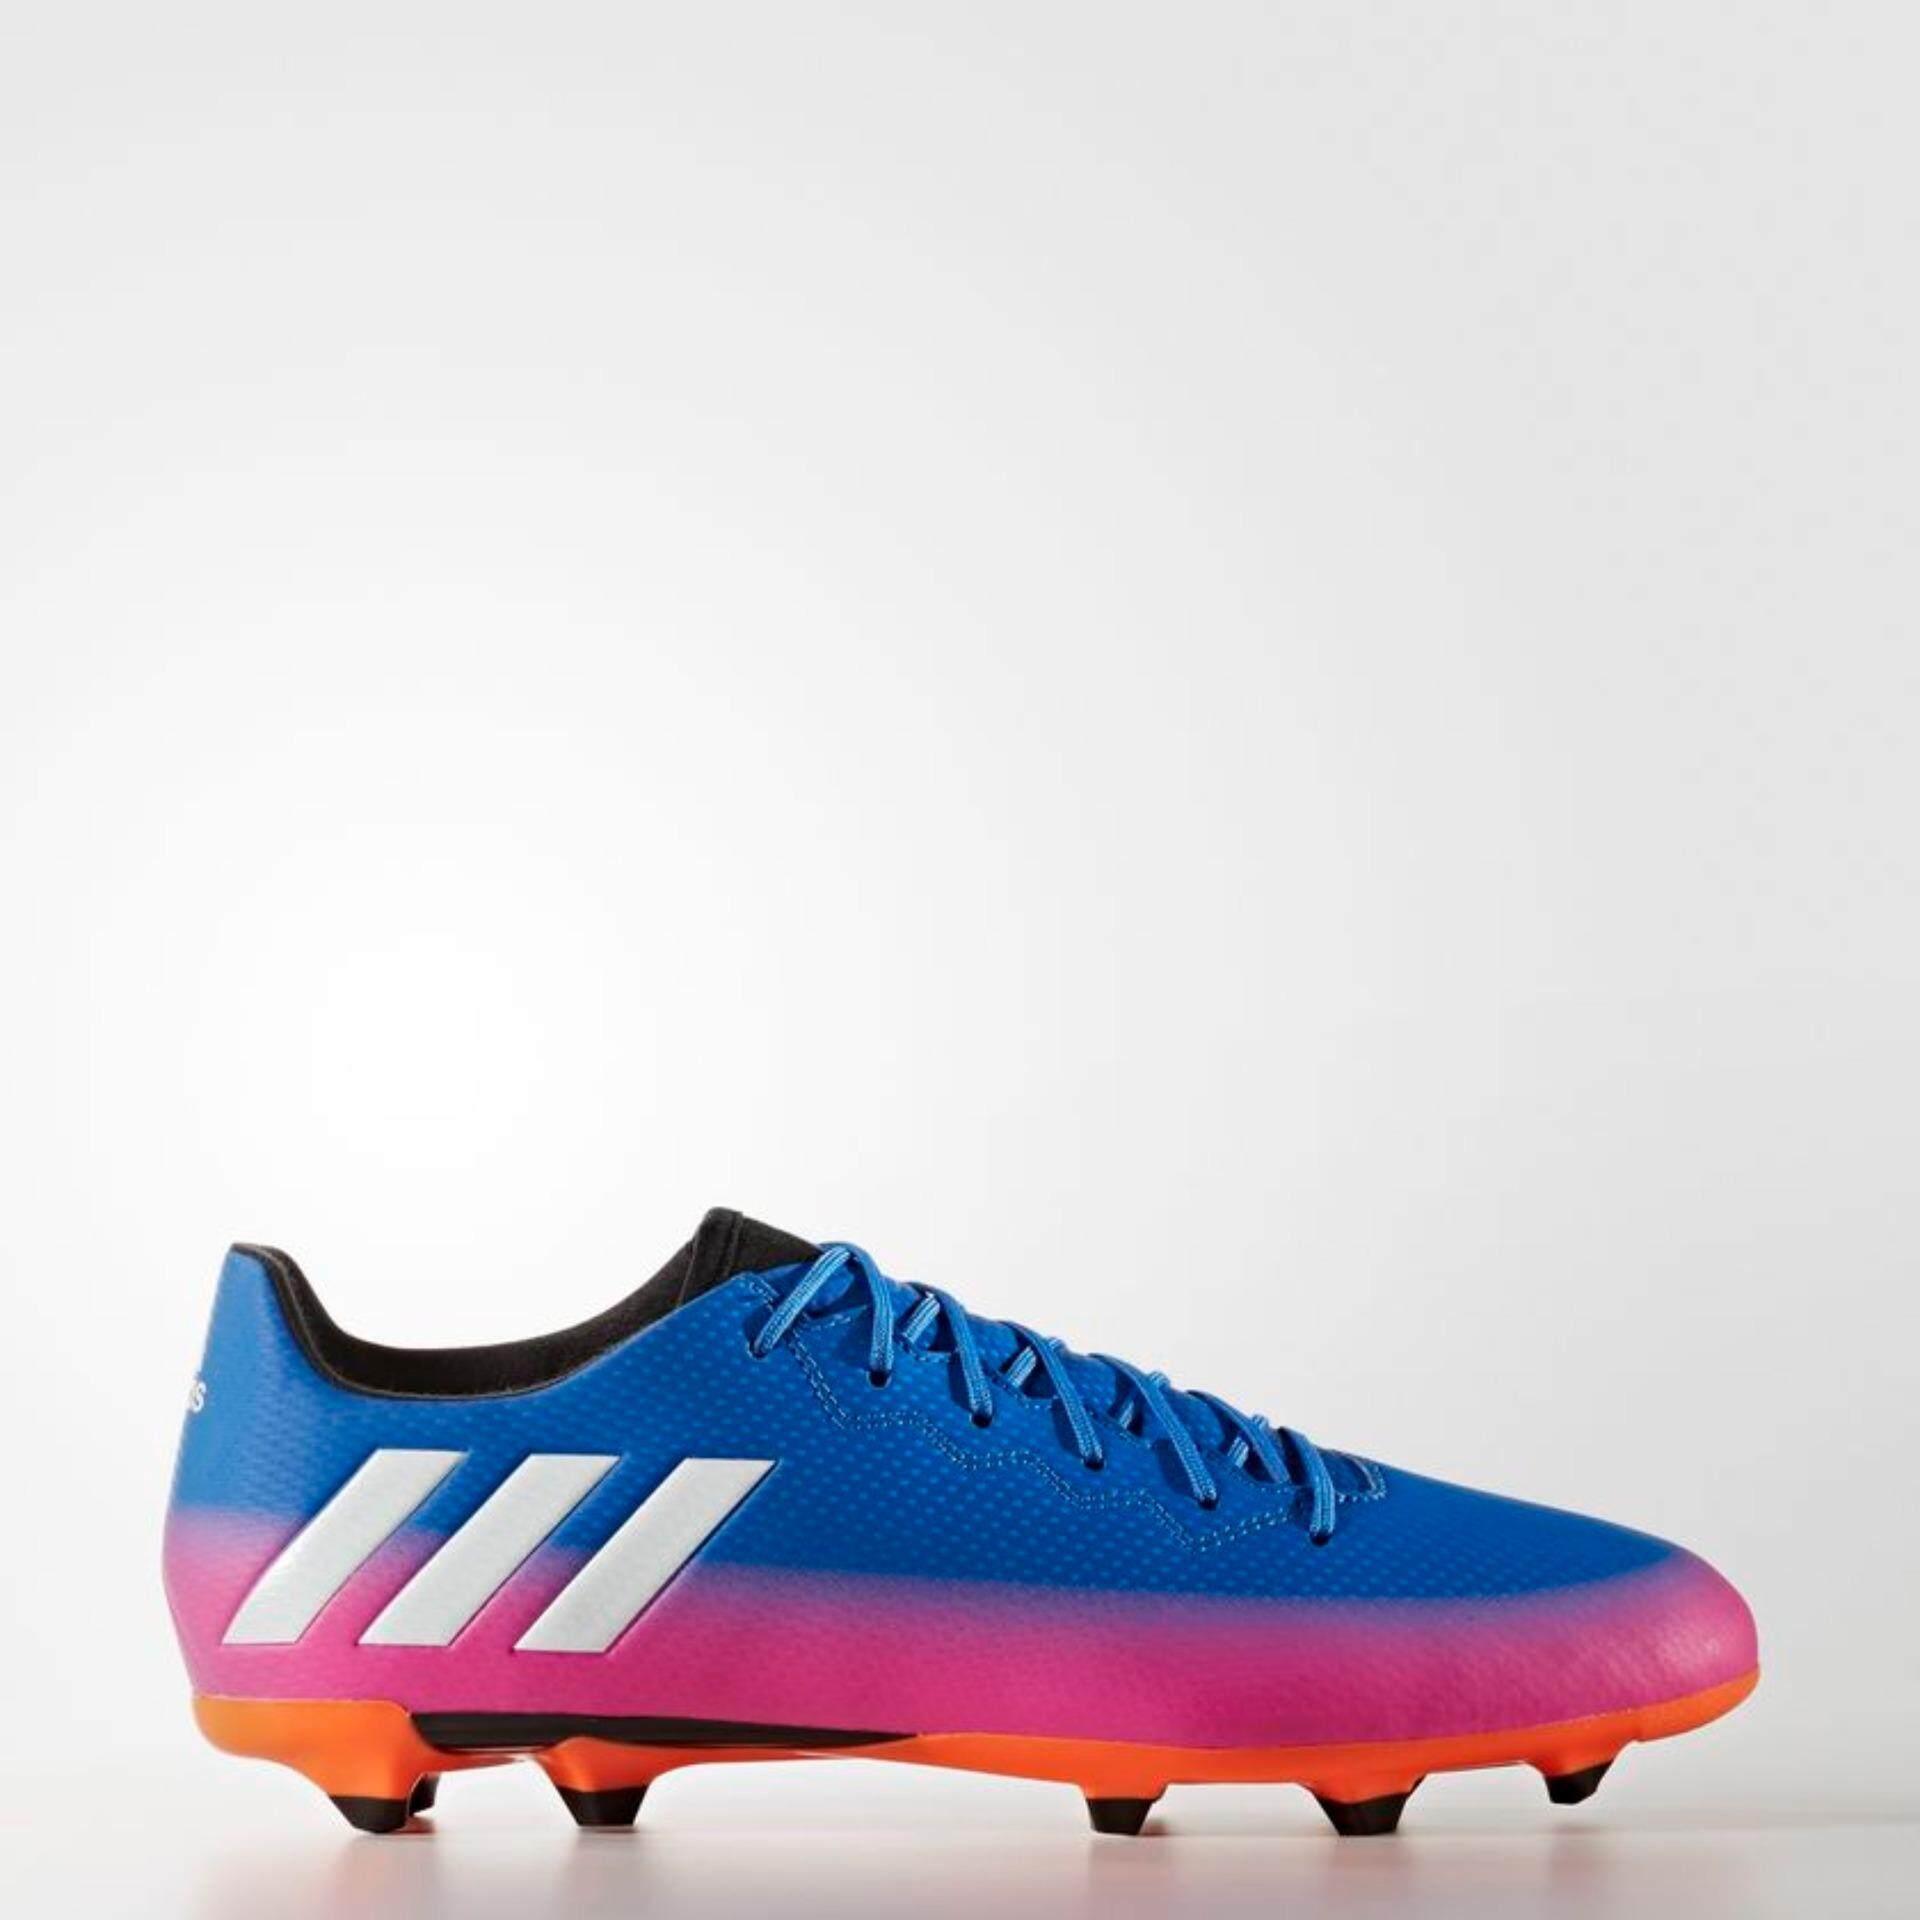 Adidas รองเท้าฟุตบอล Messi 16 3 Fg รุ่นพื้นฐาน Ba9021 เป็นต้นฉบับ